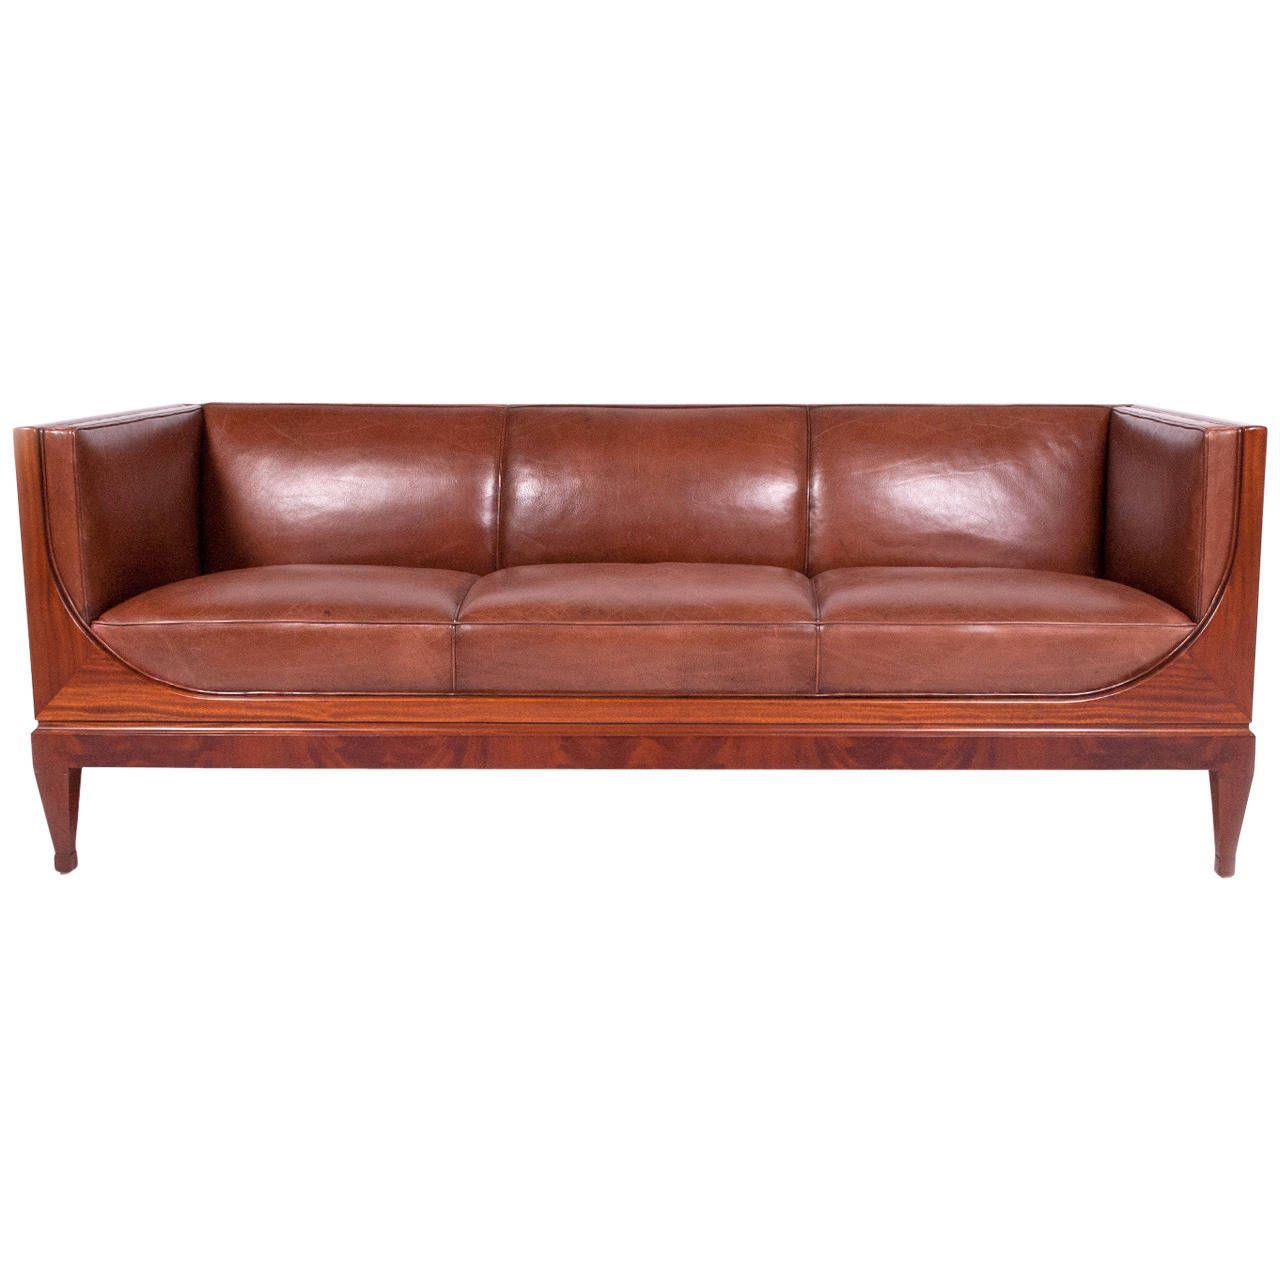 Clic Sofa By Frits Henningsen 1930s